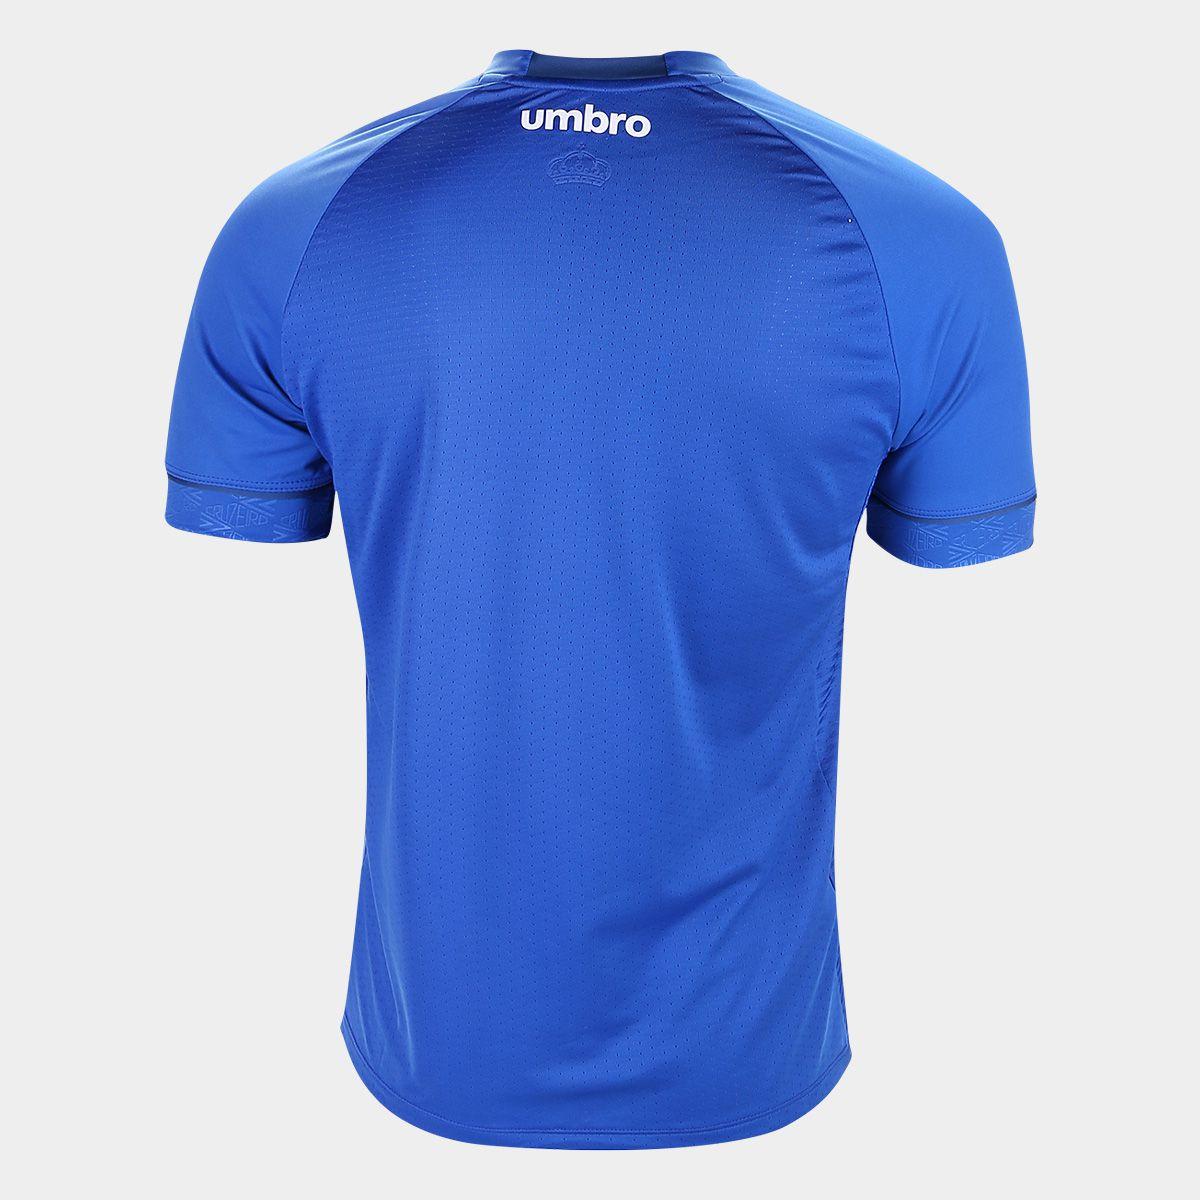 ... Camisa Cruzeiro I 18 19 s n° C  Patrocínio - Torcedor Umbro ... c9f54c92cfbb9